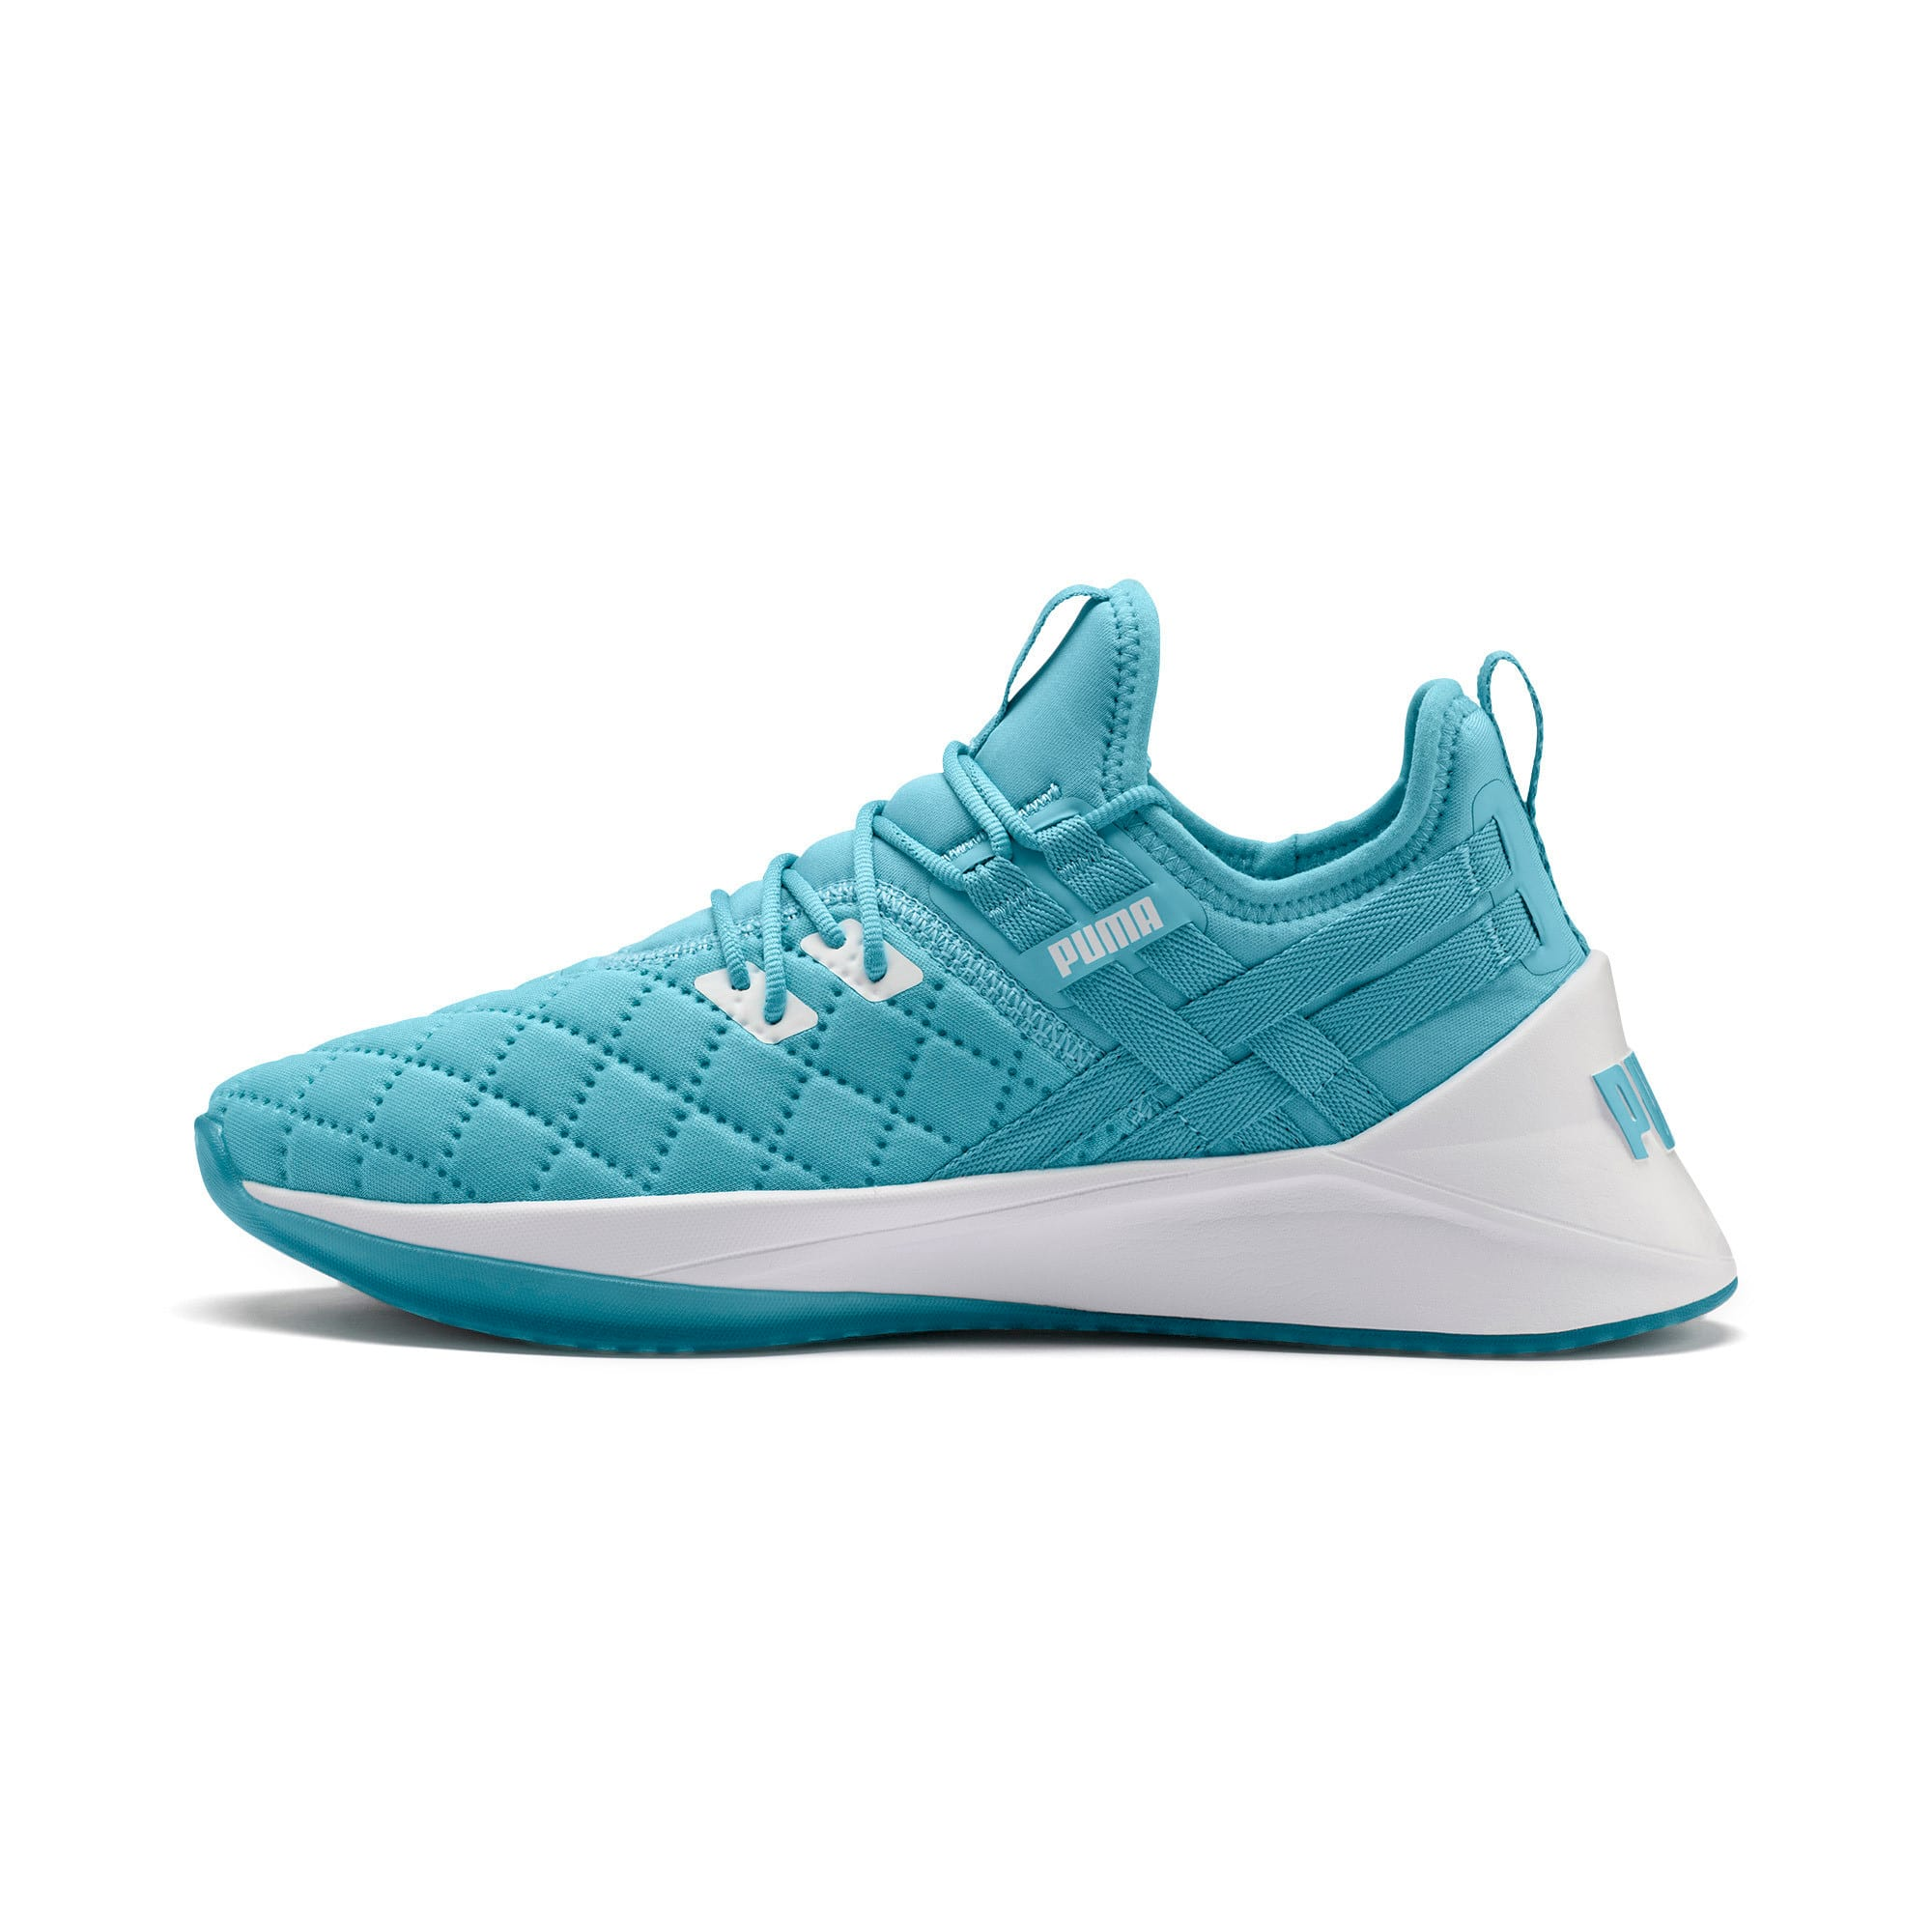 Thumbnail 1 of Jaab XT Quilt Women's Training Shoes, Milky Blue-Puma White, medium